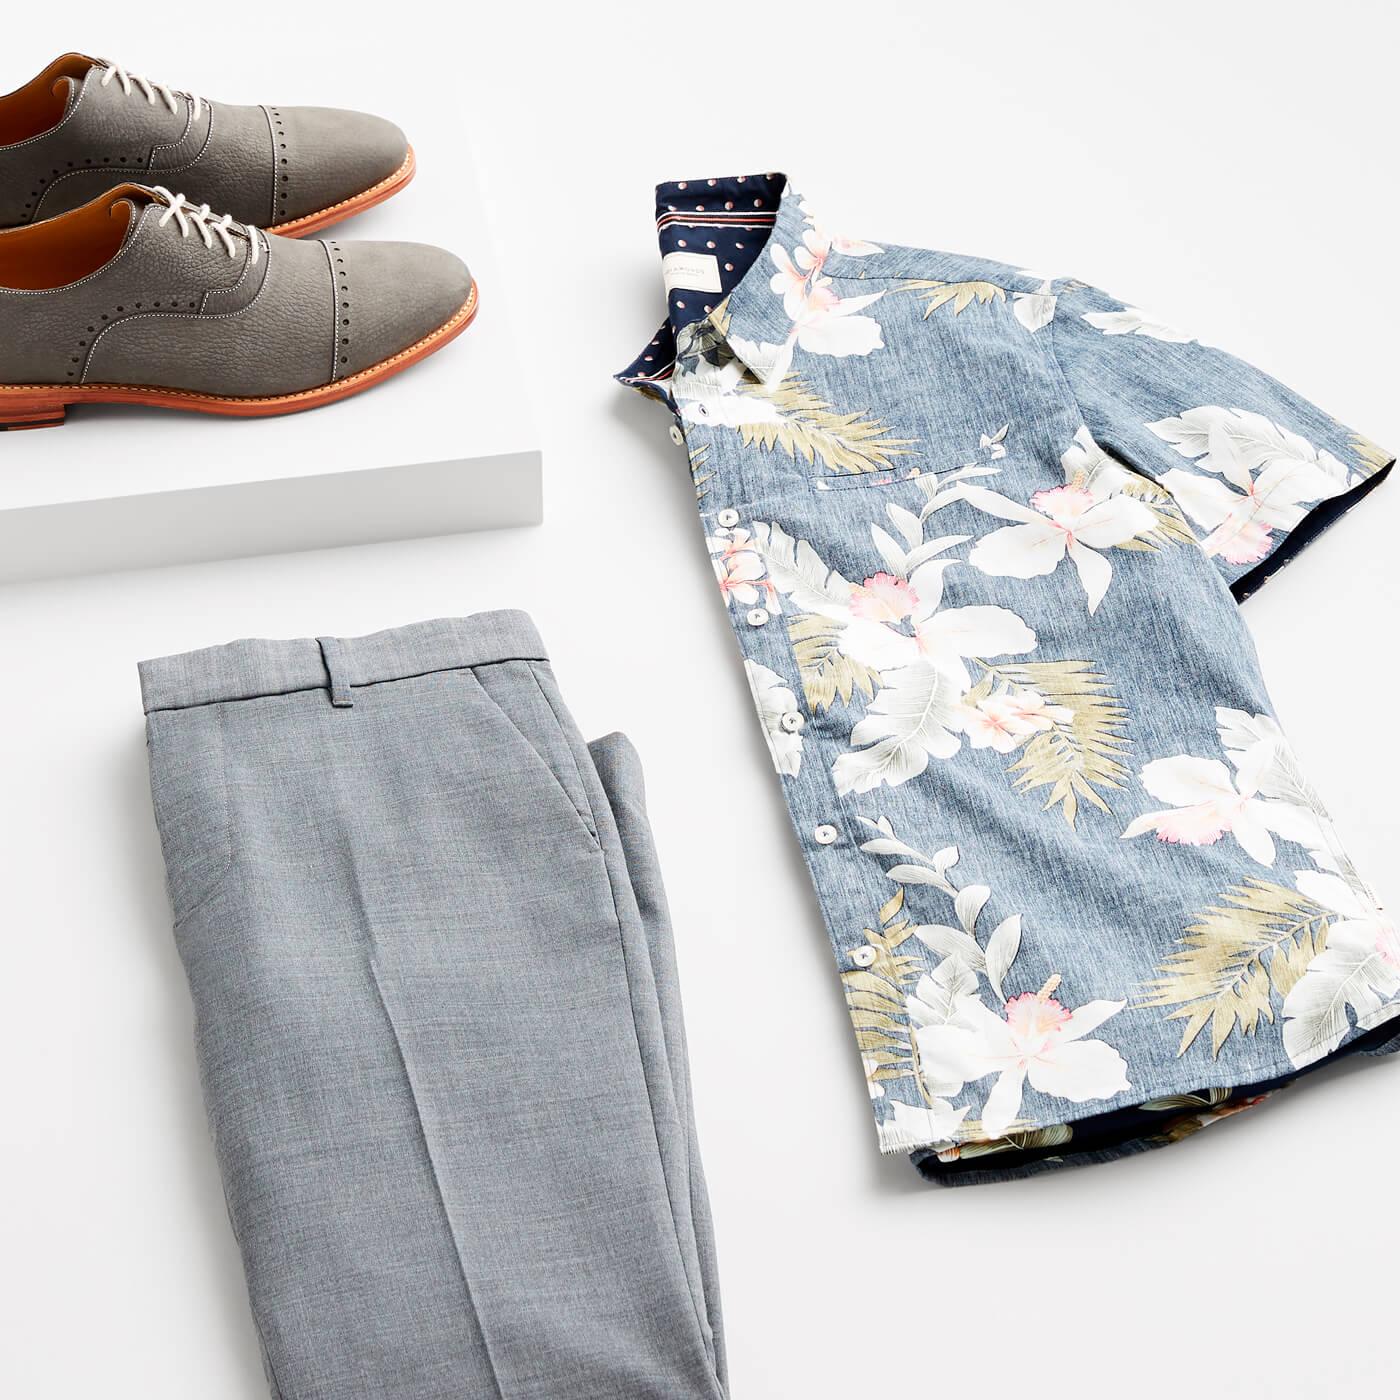 tropical shirt and grey slacks